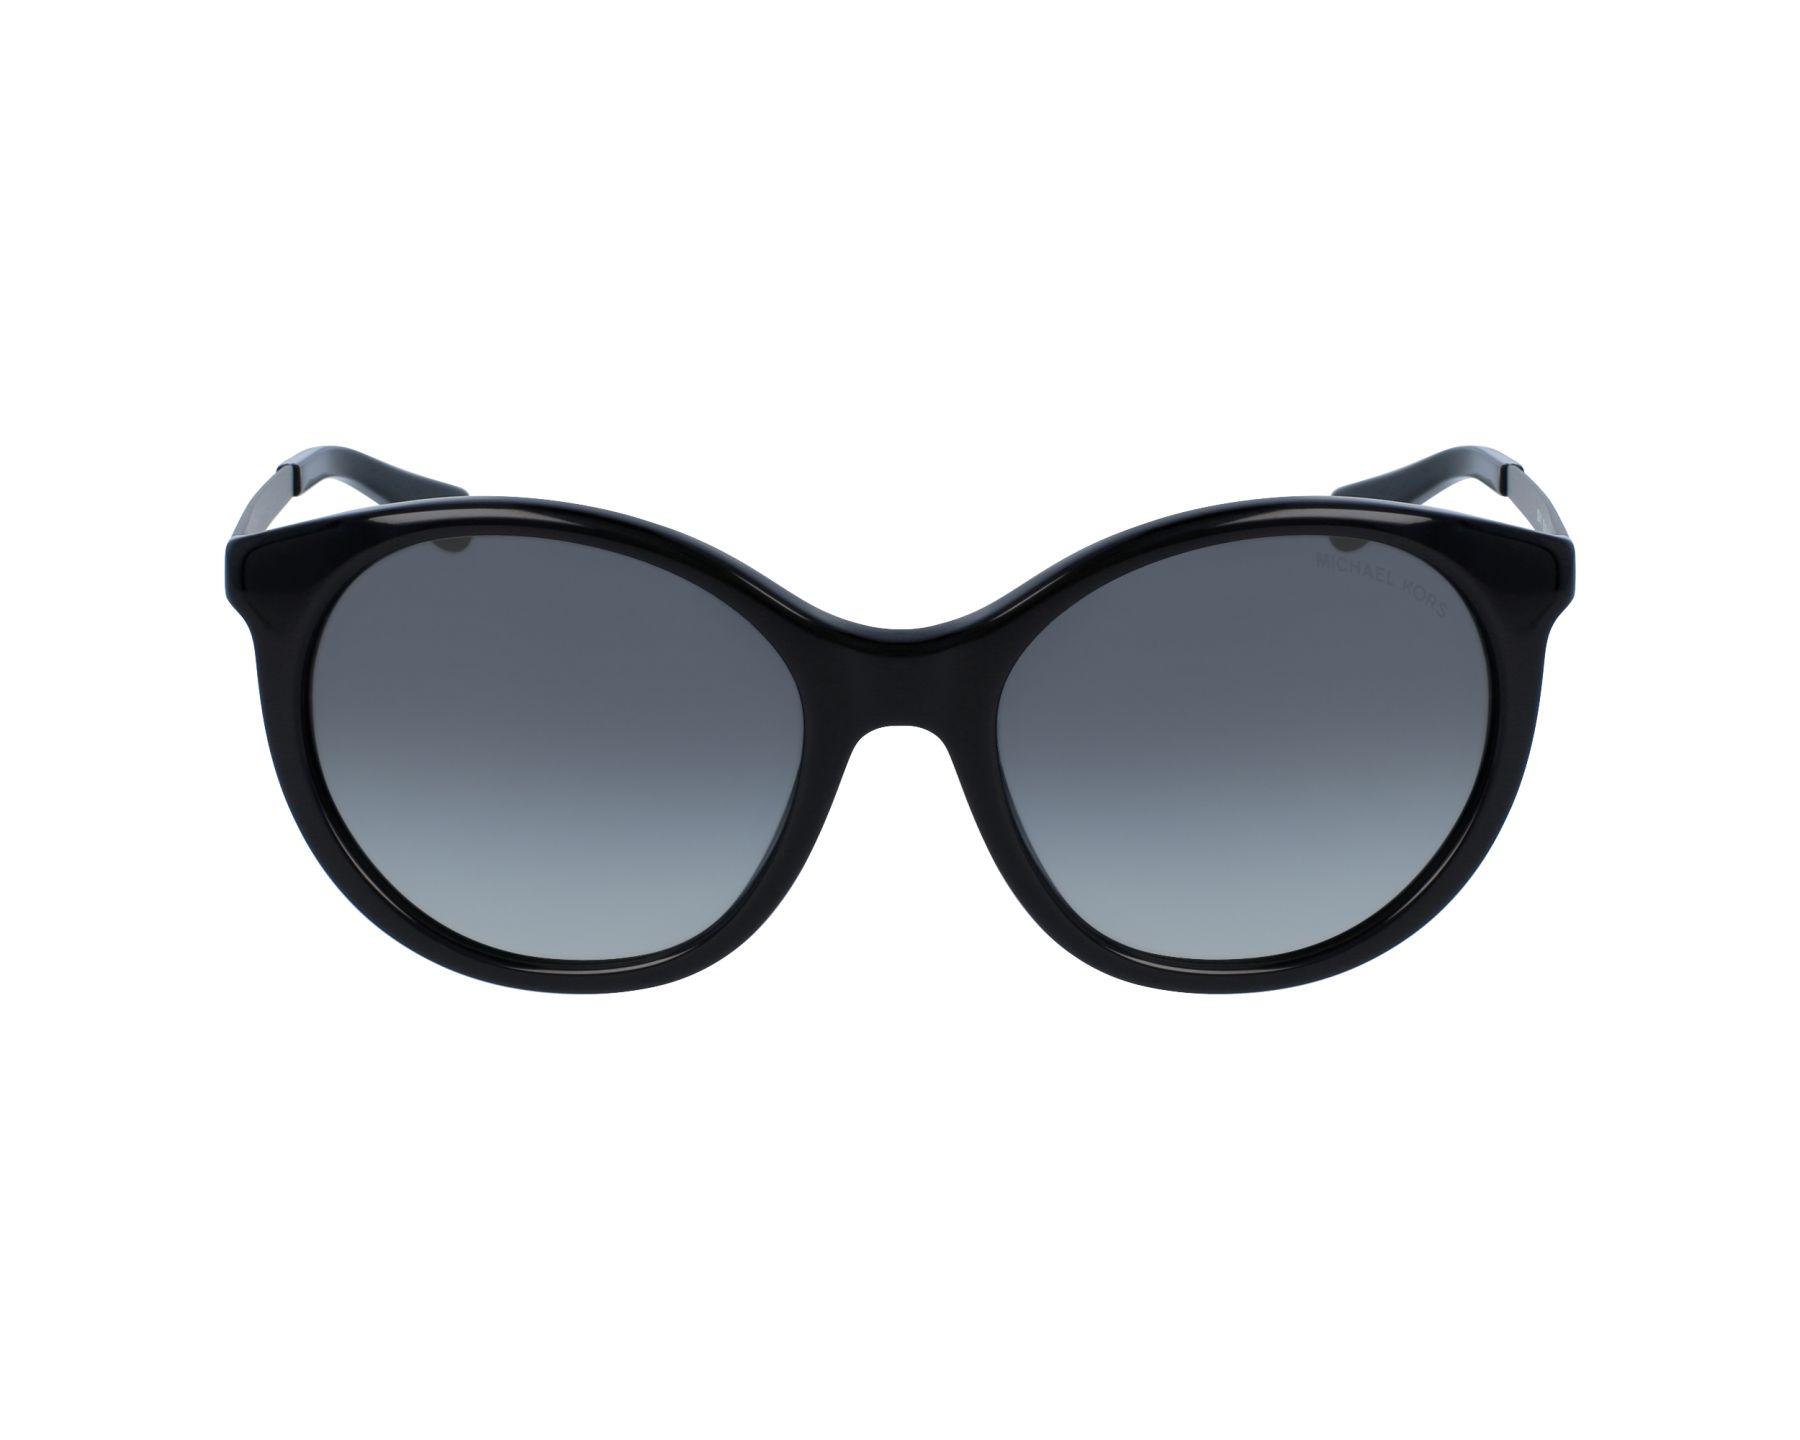 c85a5c6e57 Sunglasses Michael Kors MK-2034 320411 55-18 Black Silver profile view